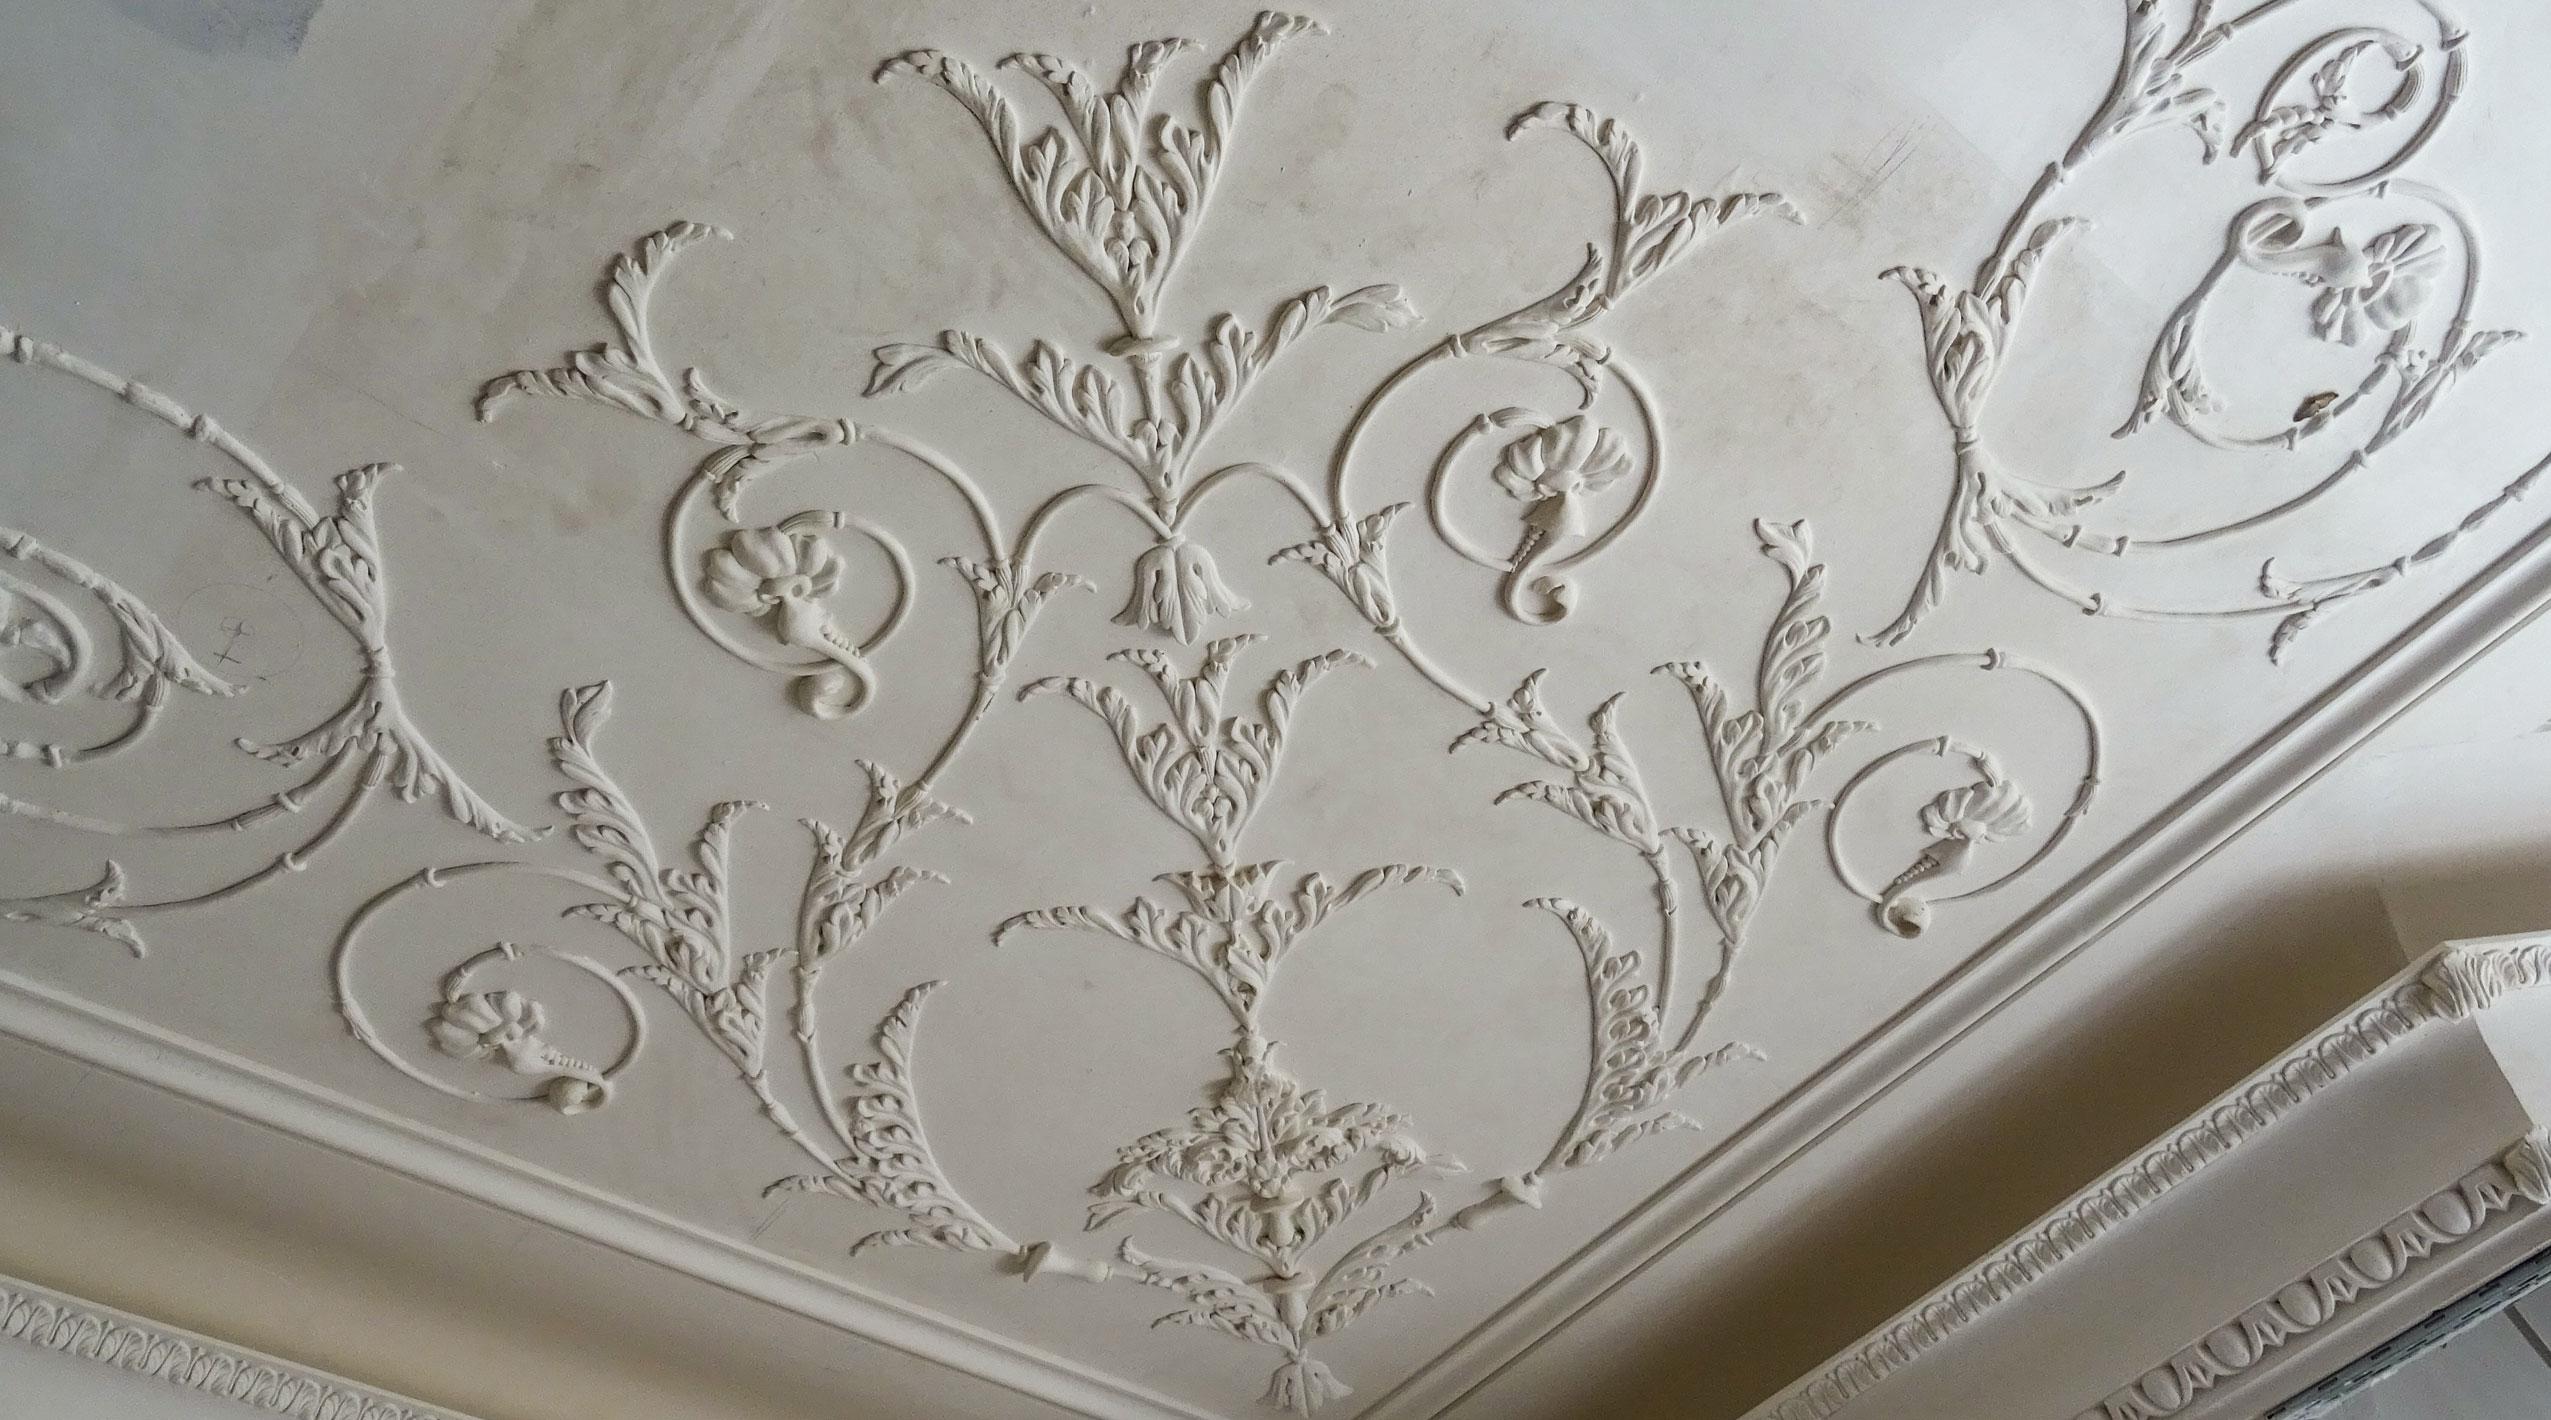 Animal Ornamentation in Plasterwork | Heritage Plaster Services